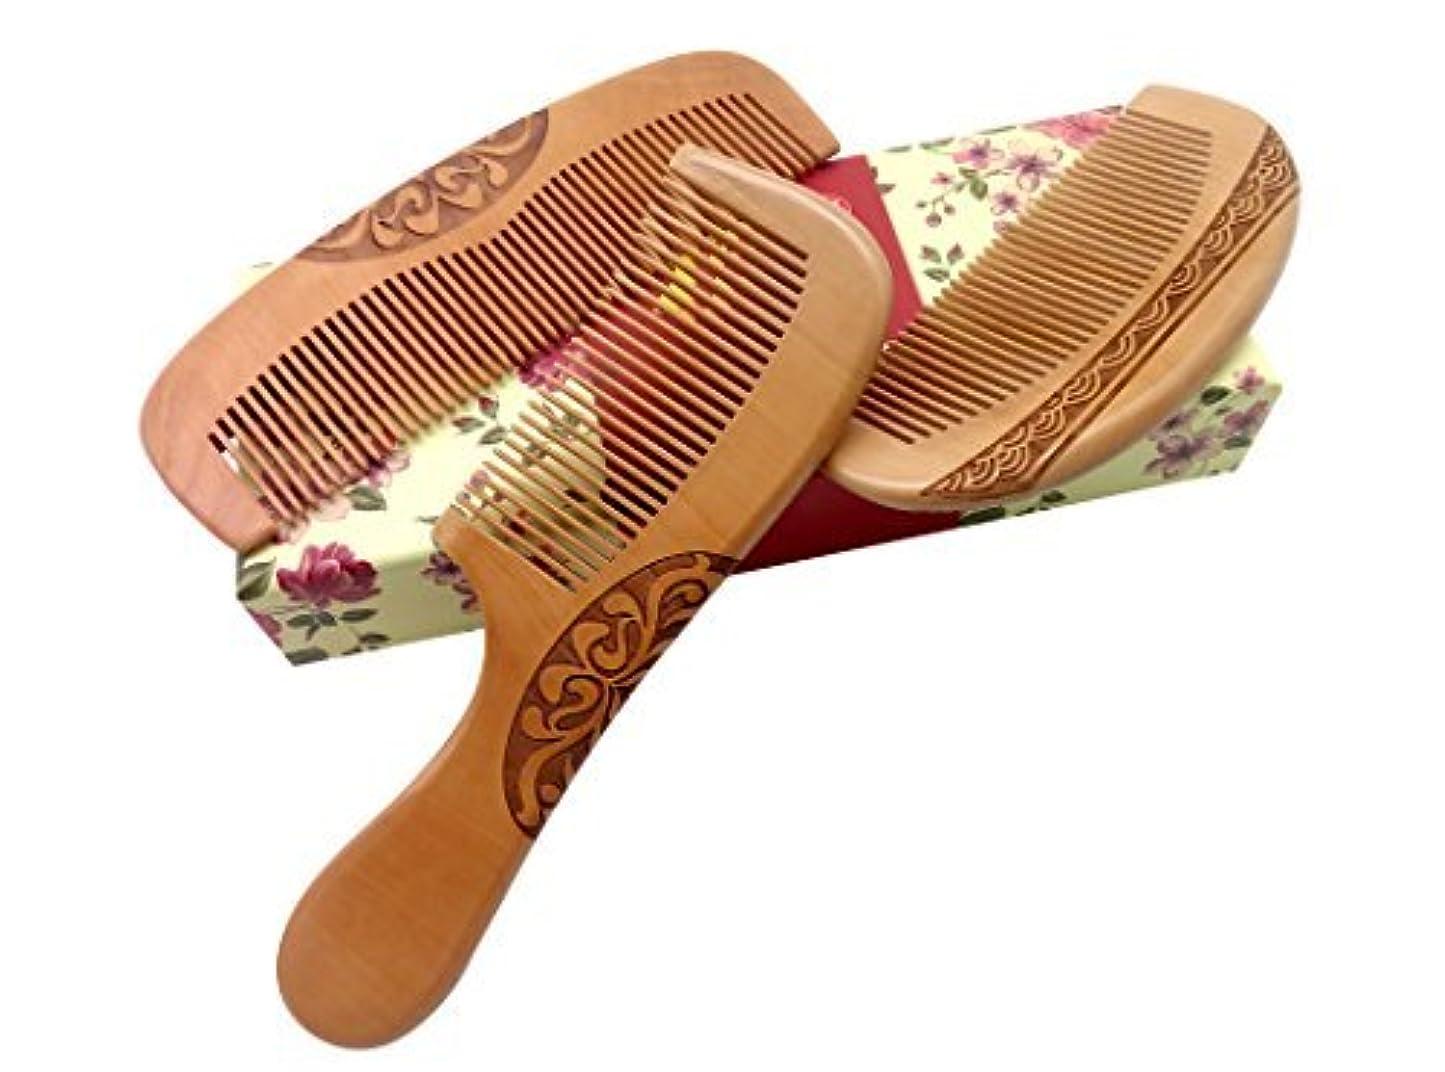 ZuiKyuan Wooden Hair Comb No Static Hair Detangler Detangling Comb with Premium Gift Box 3 Pcs [並行輸入品]